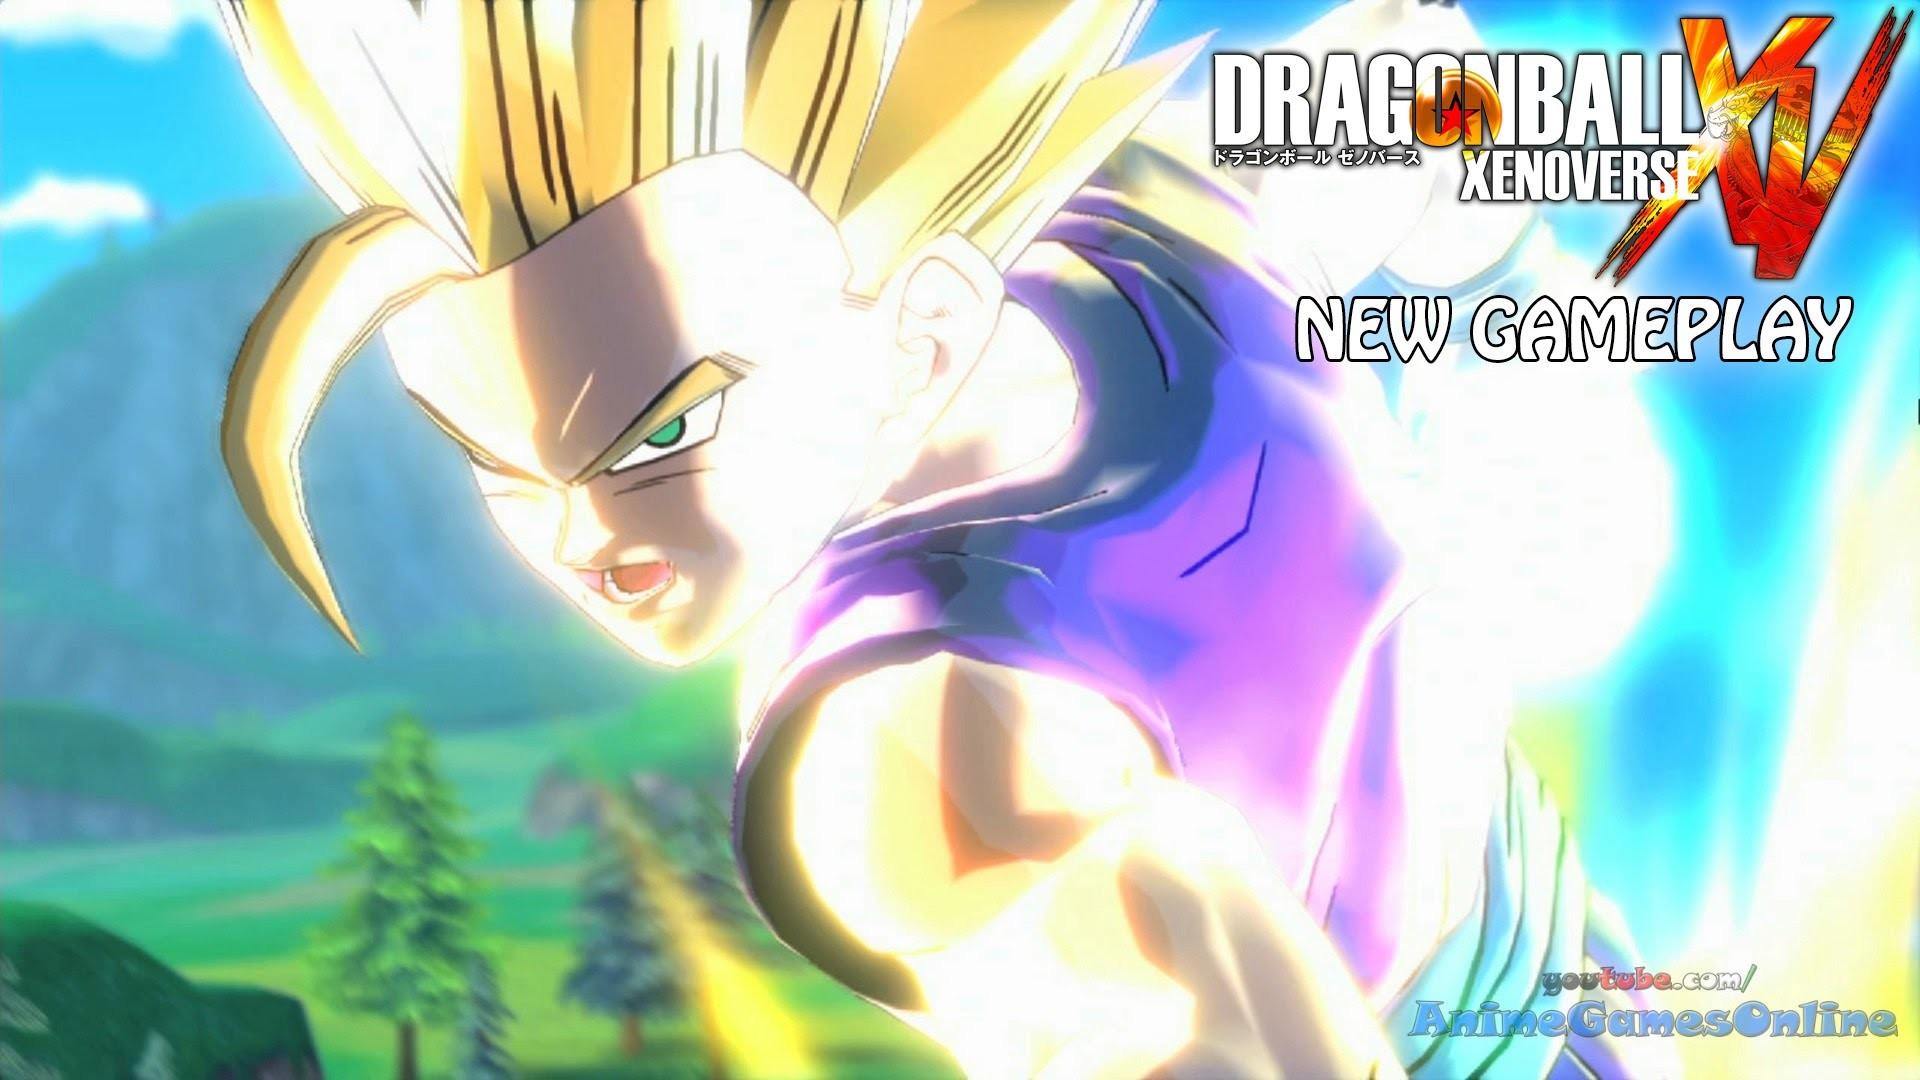 Dragon Ball Xenoverse Gameplay HD 1080p – Ultimate Gohan / Super Vegito vs  Buu, SS2 Gohan vs Cell – YouTube